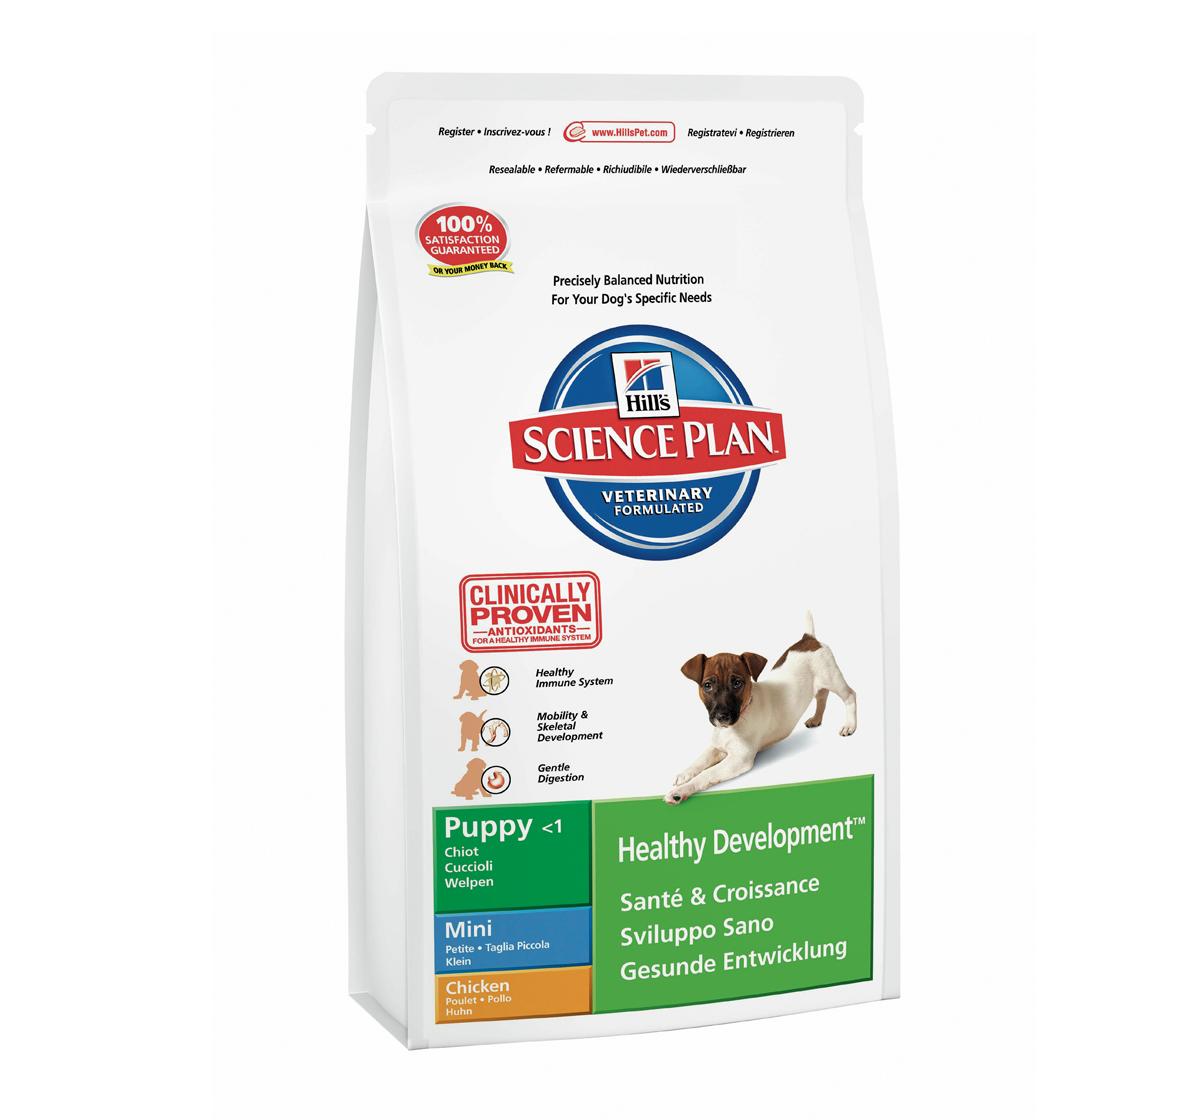 Hills Science Plan Large Breed Dog Food